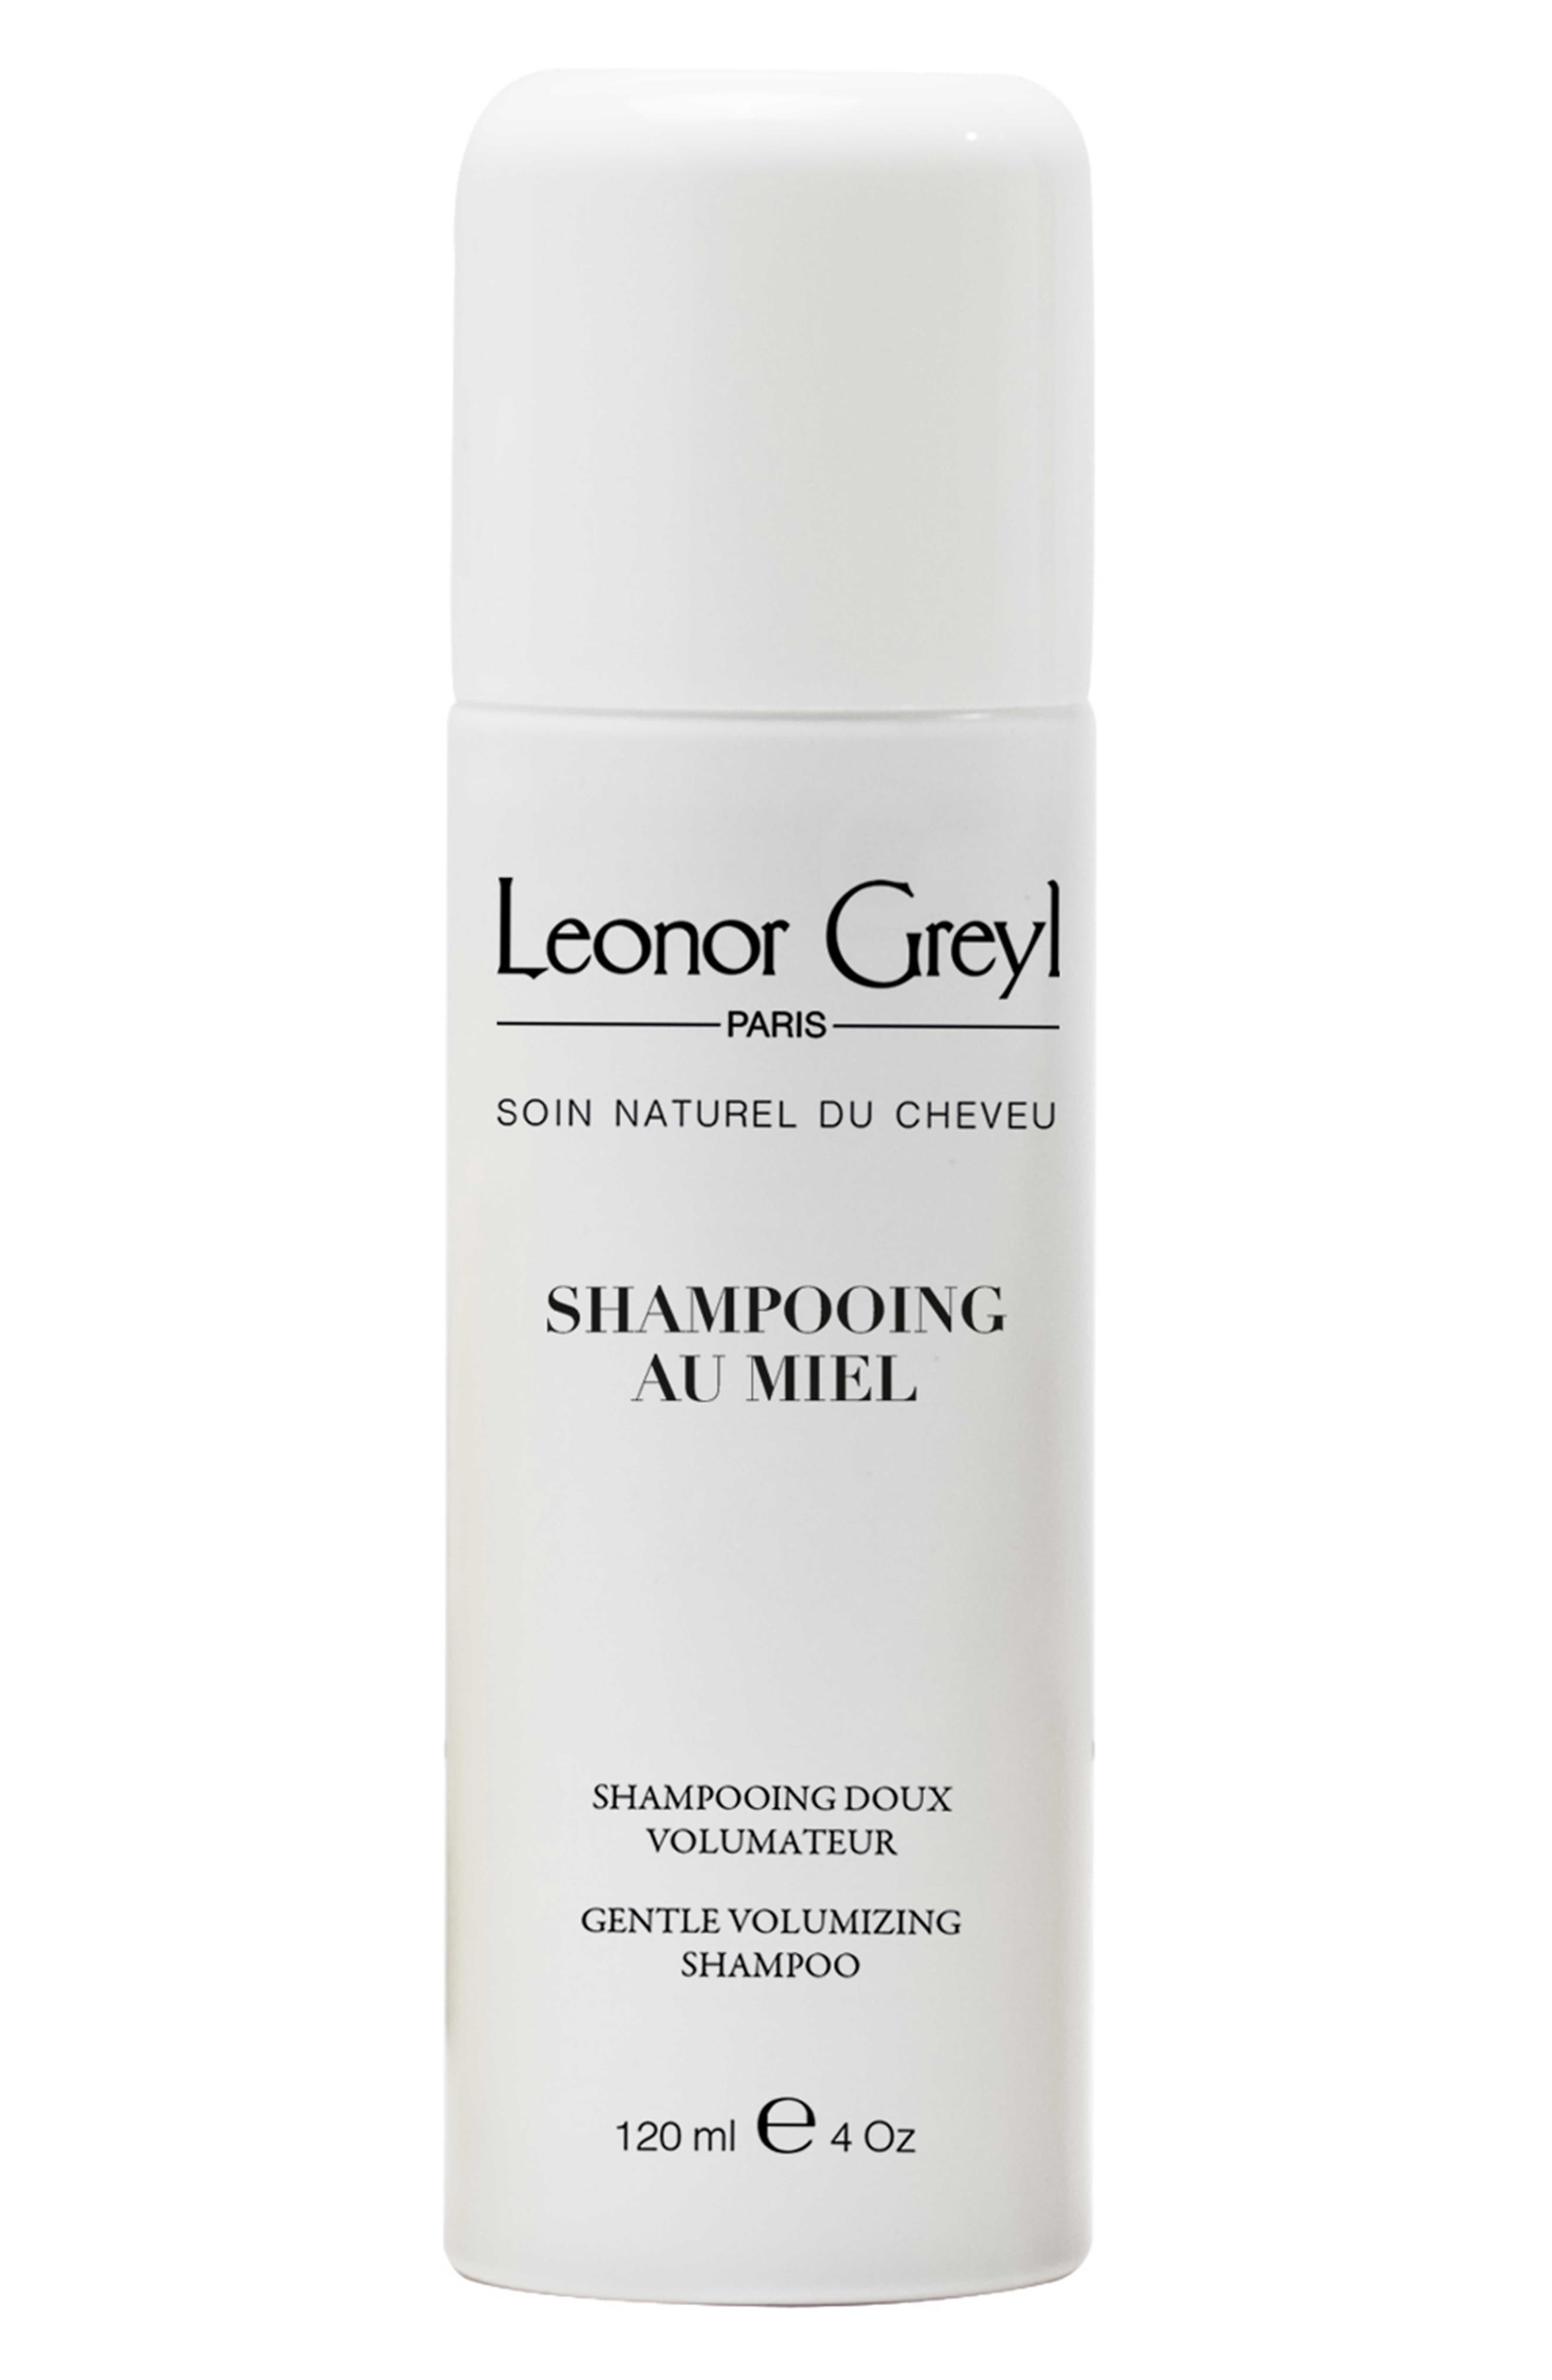 Main Image - Leonor Greyl PARIS 'Shampooing au Miel' Volumizing Shampoo